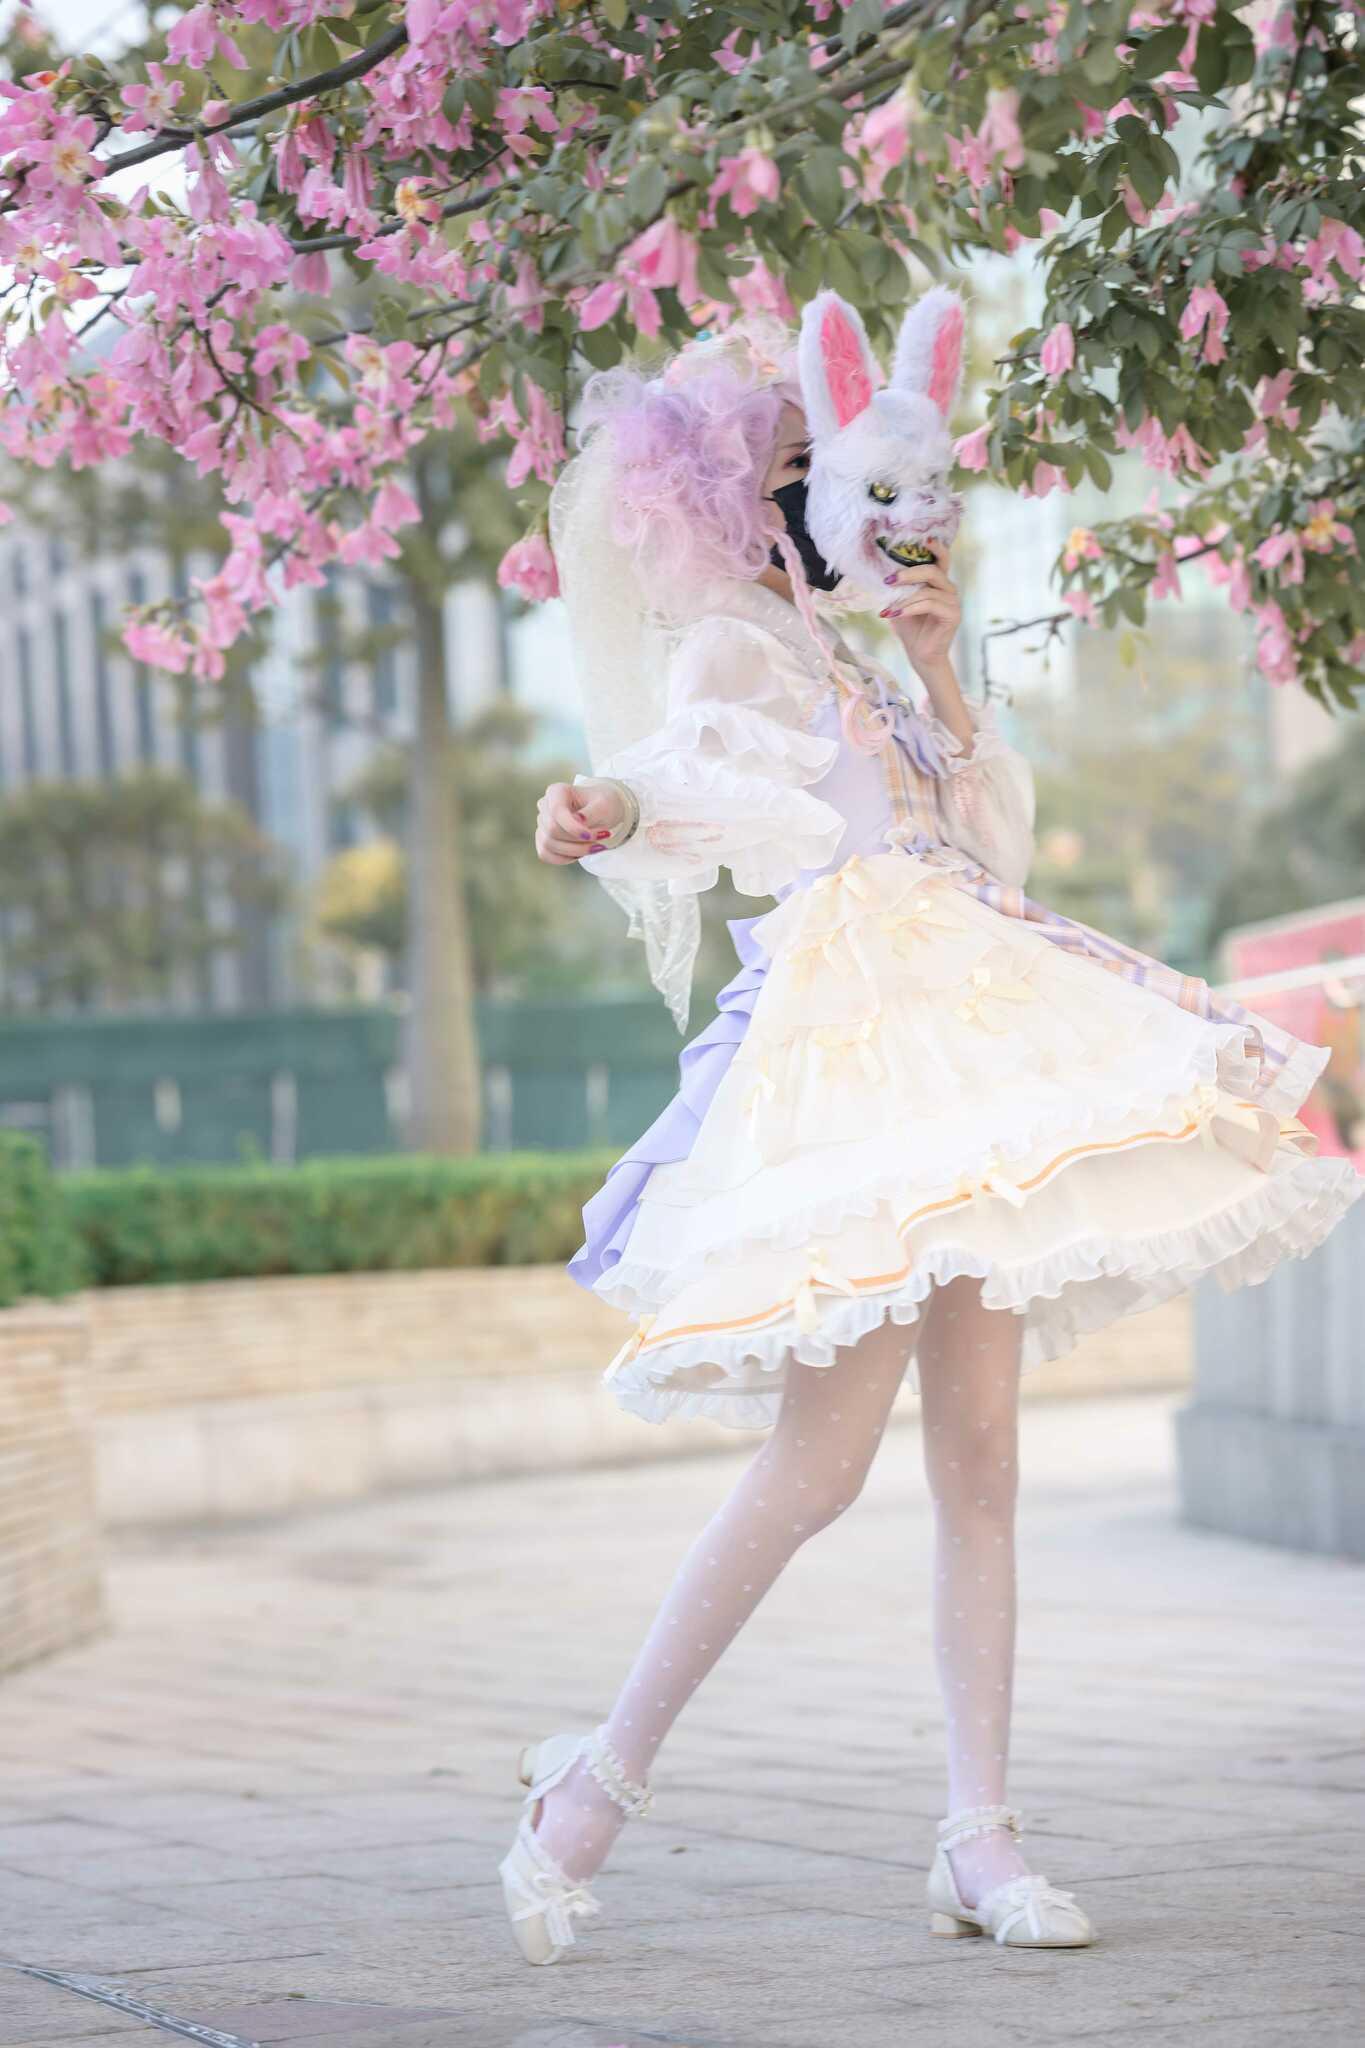 [Pre-order] Suiyi - Heartbeat Melody JSK